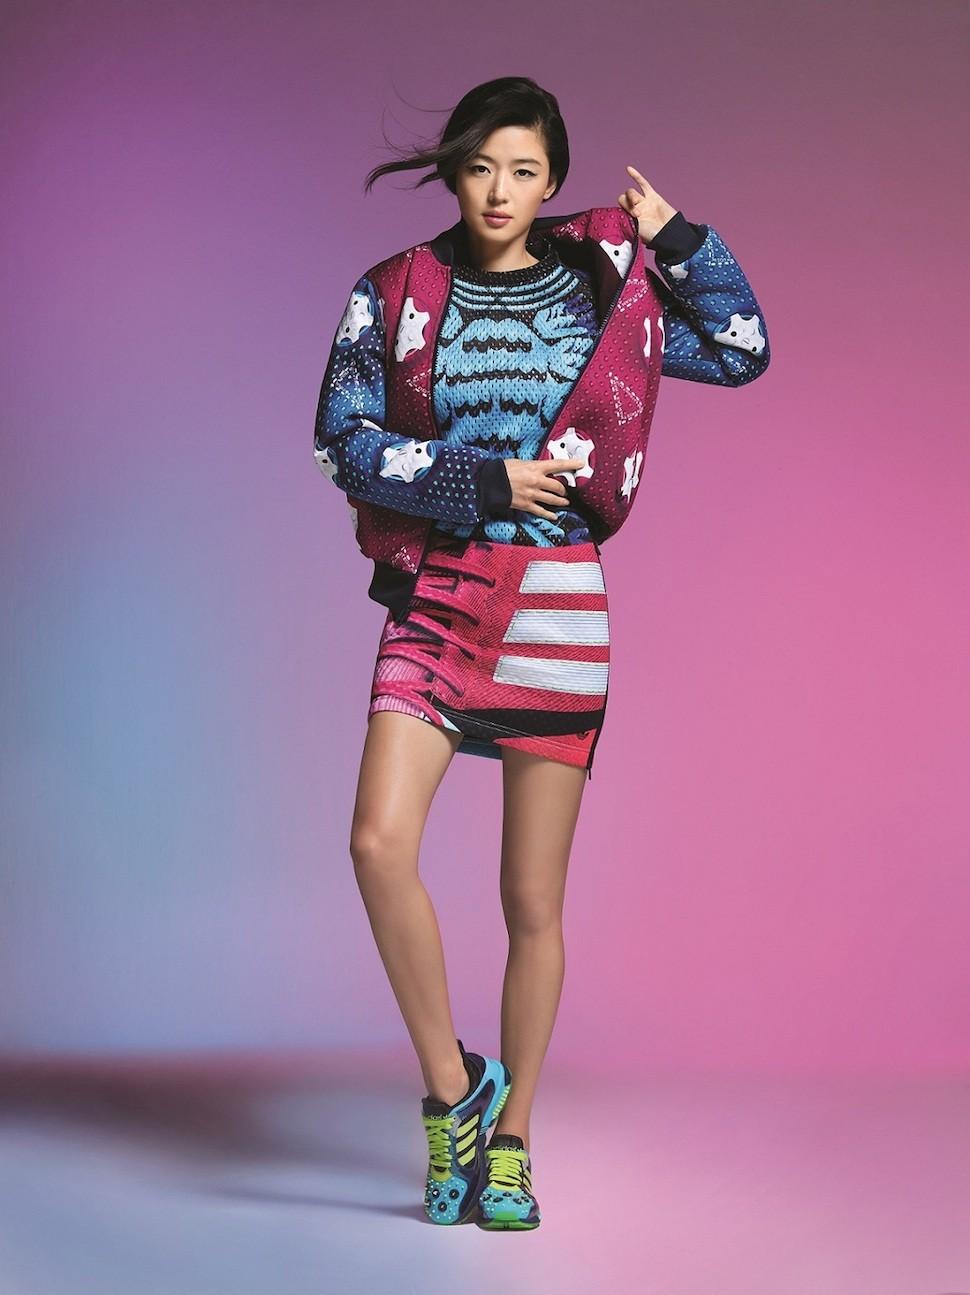 全智賢演繹adidas Originals by Mary Katrantzou系列